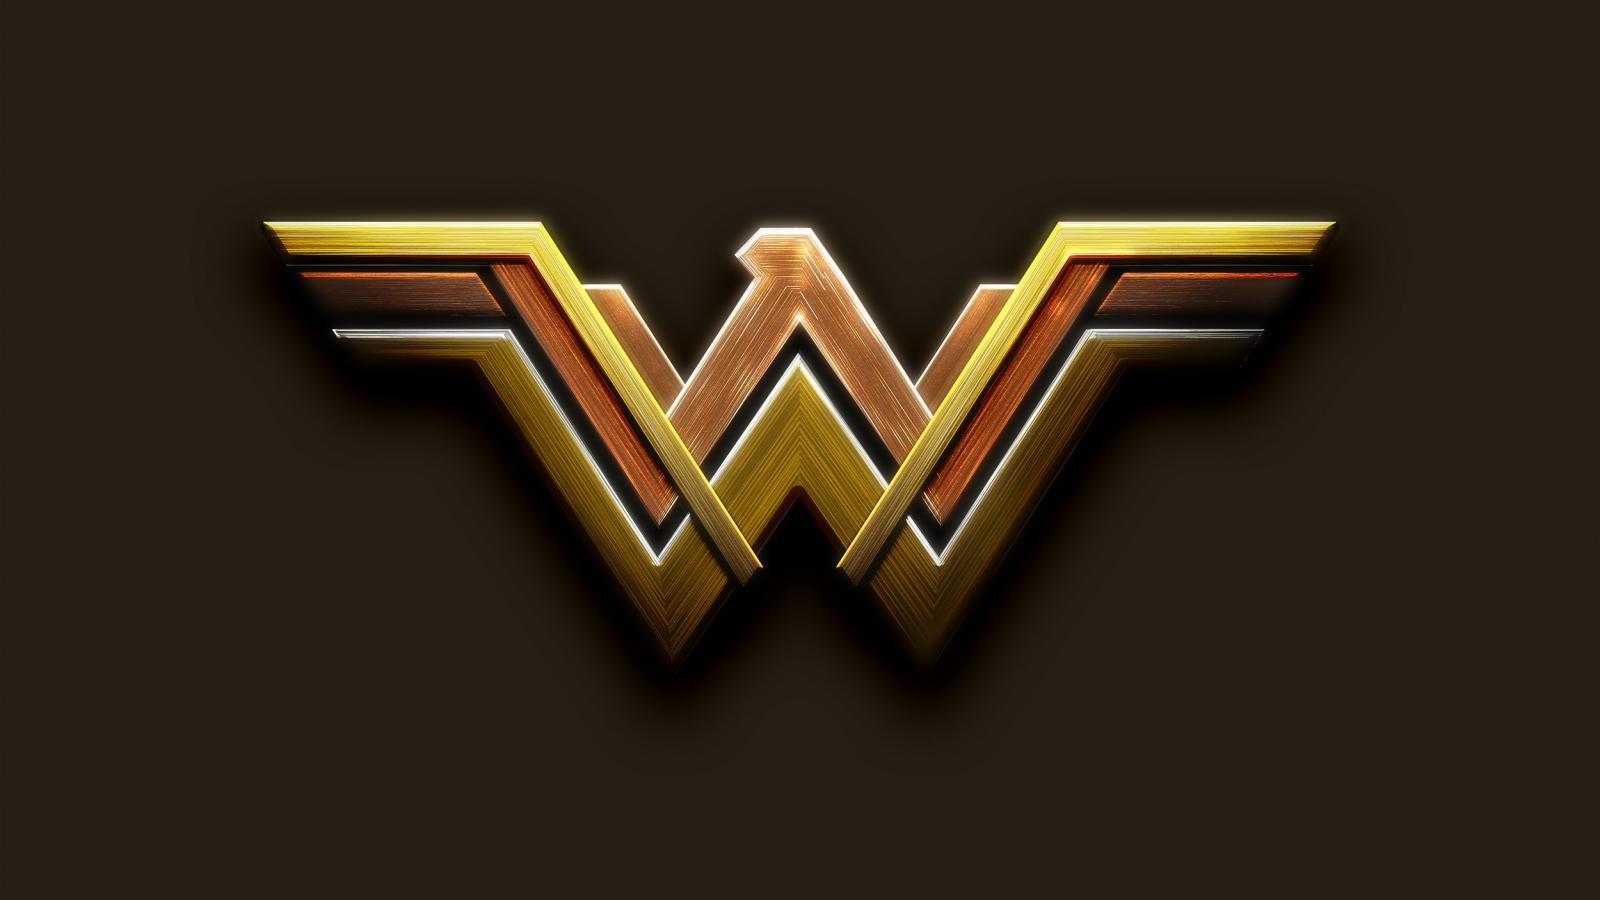 Wonder Woman Logo Wallpaper 61 Images: Abduzeedo